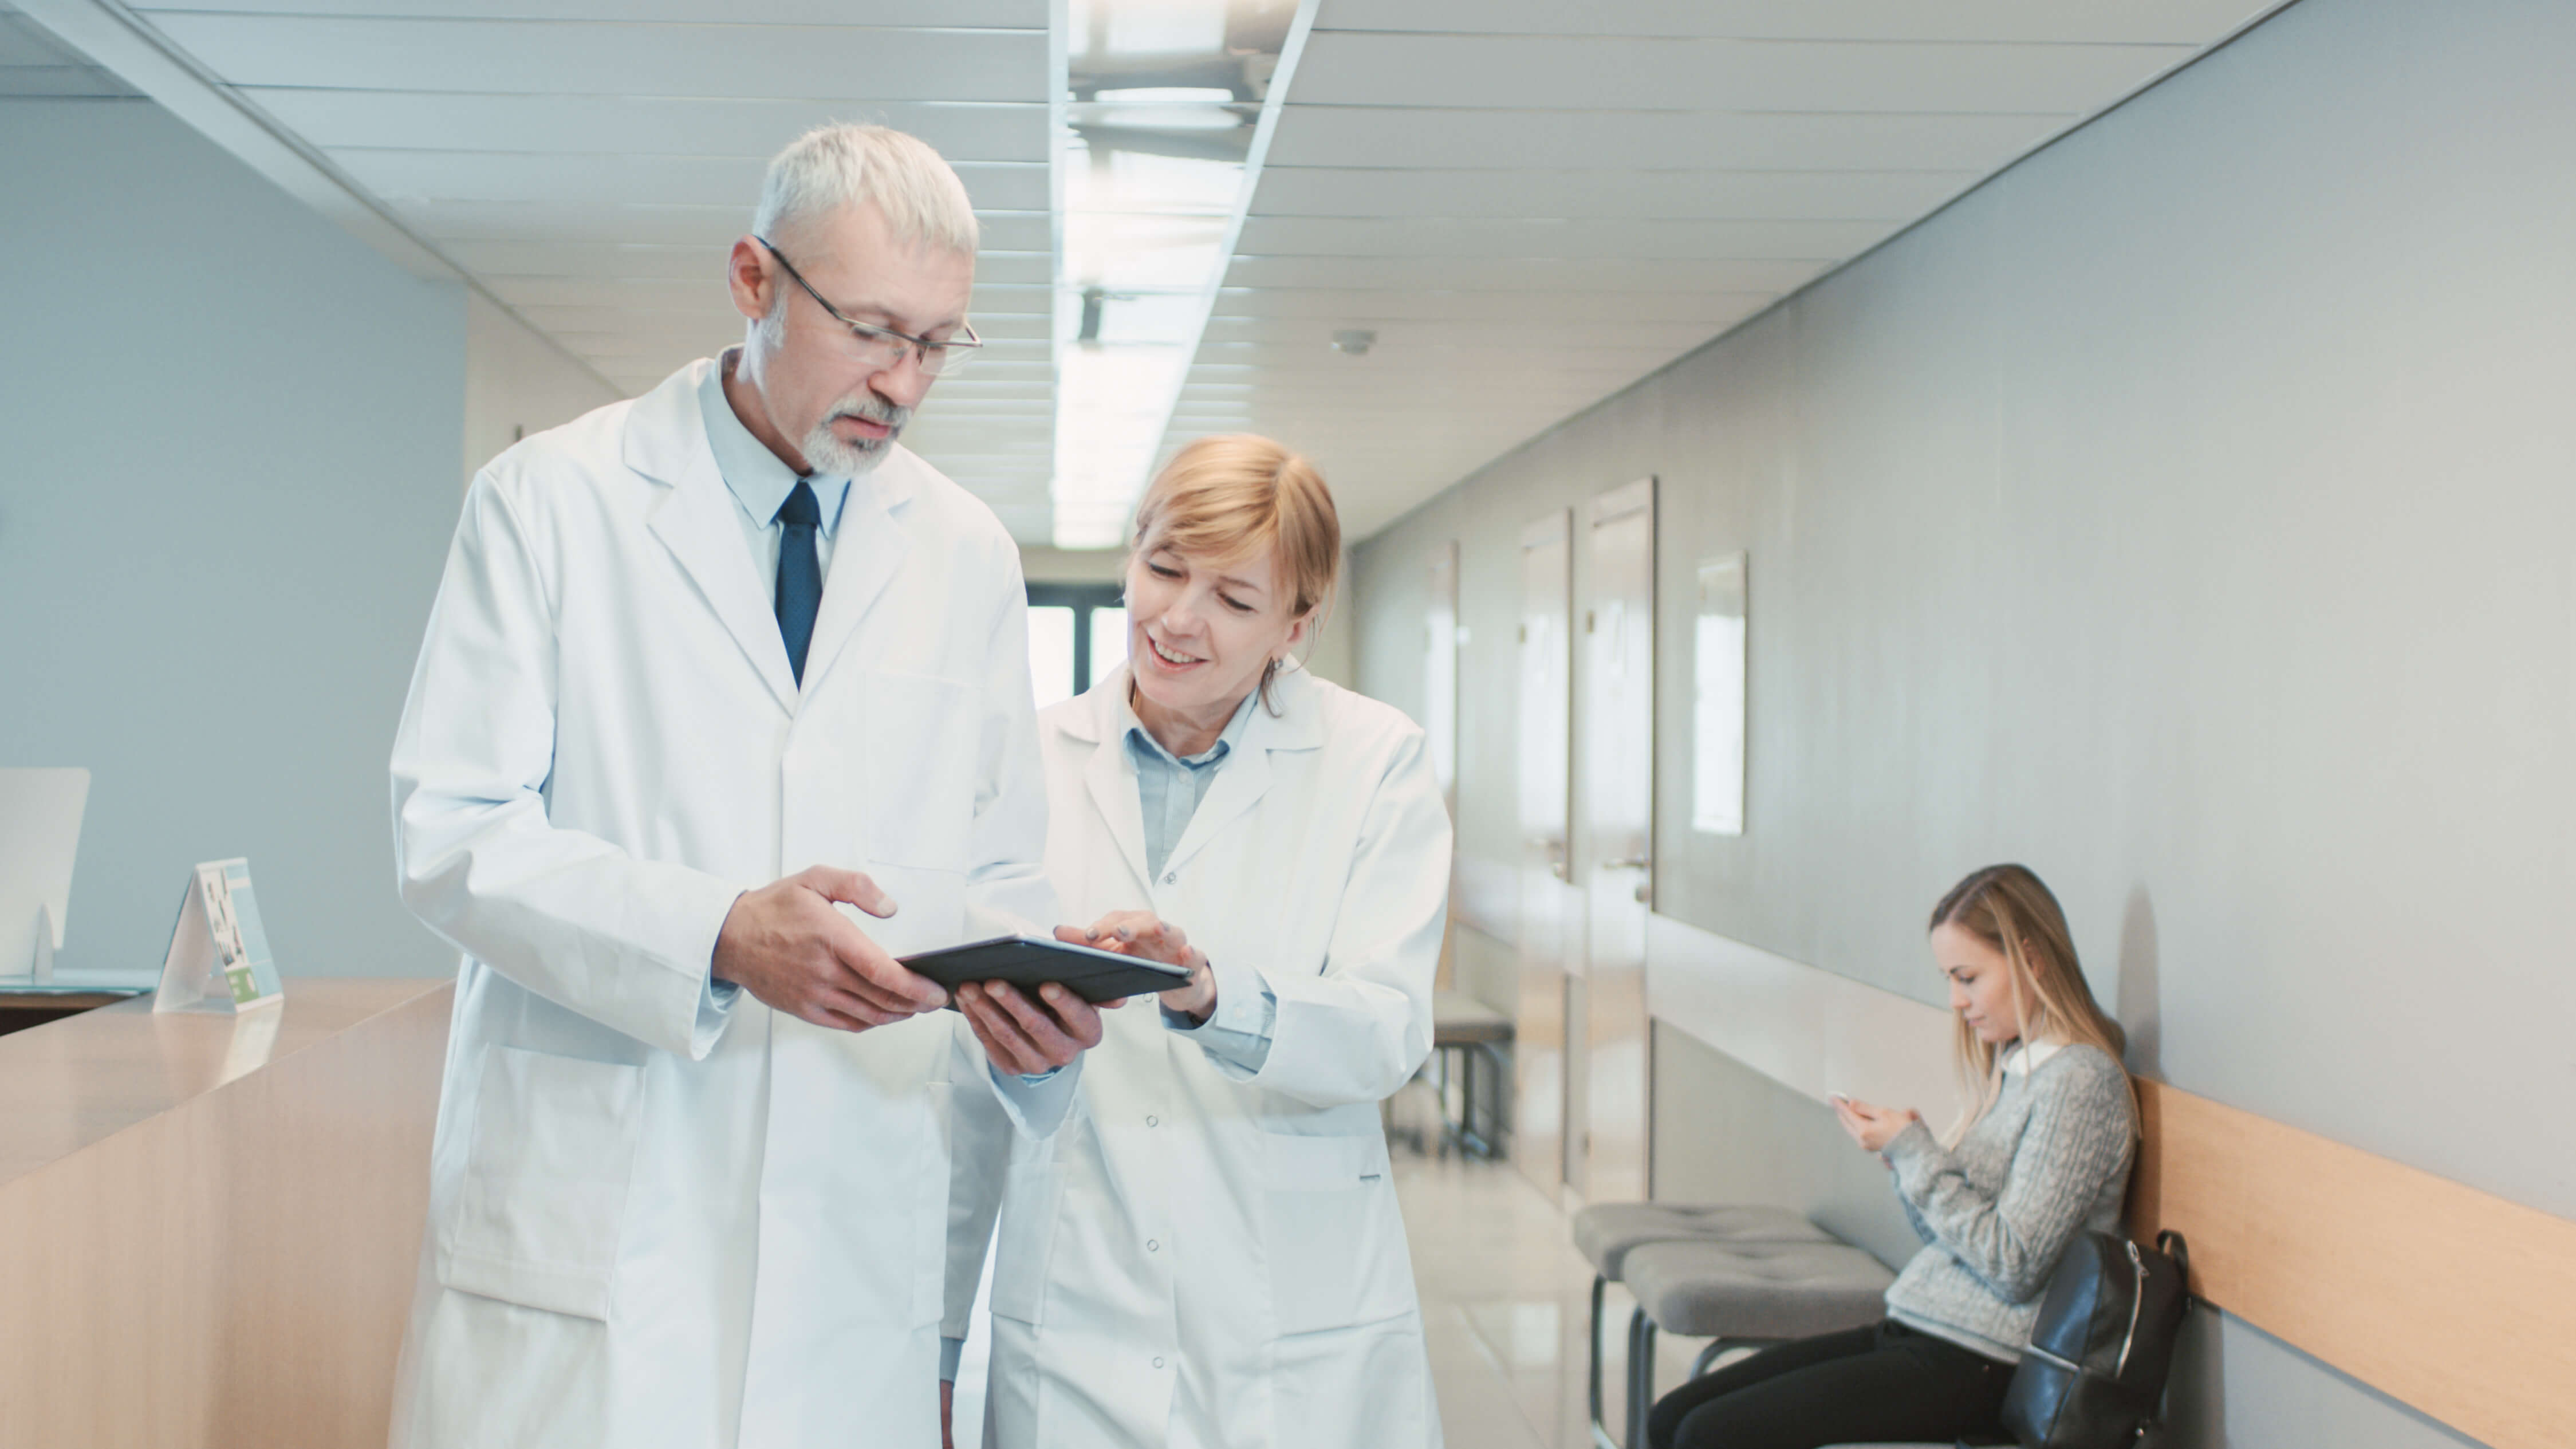 Two clinicians walking